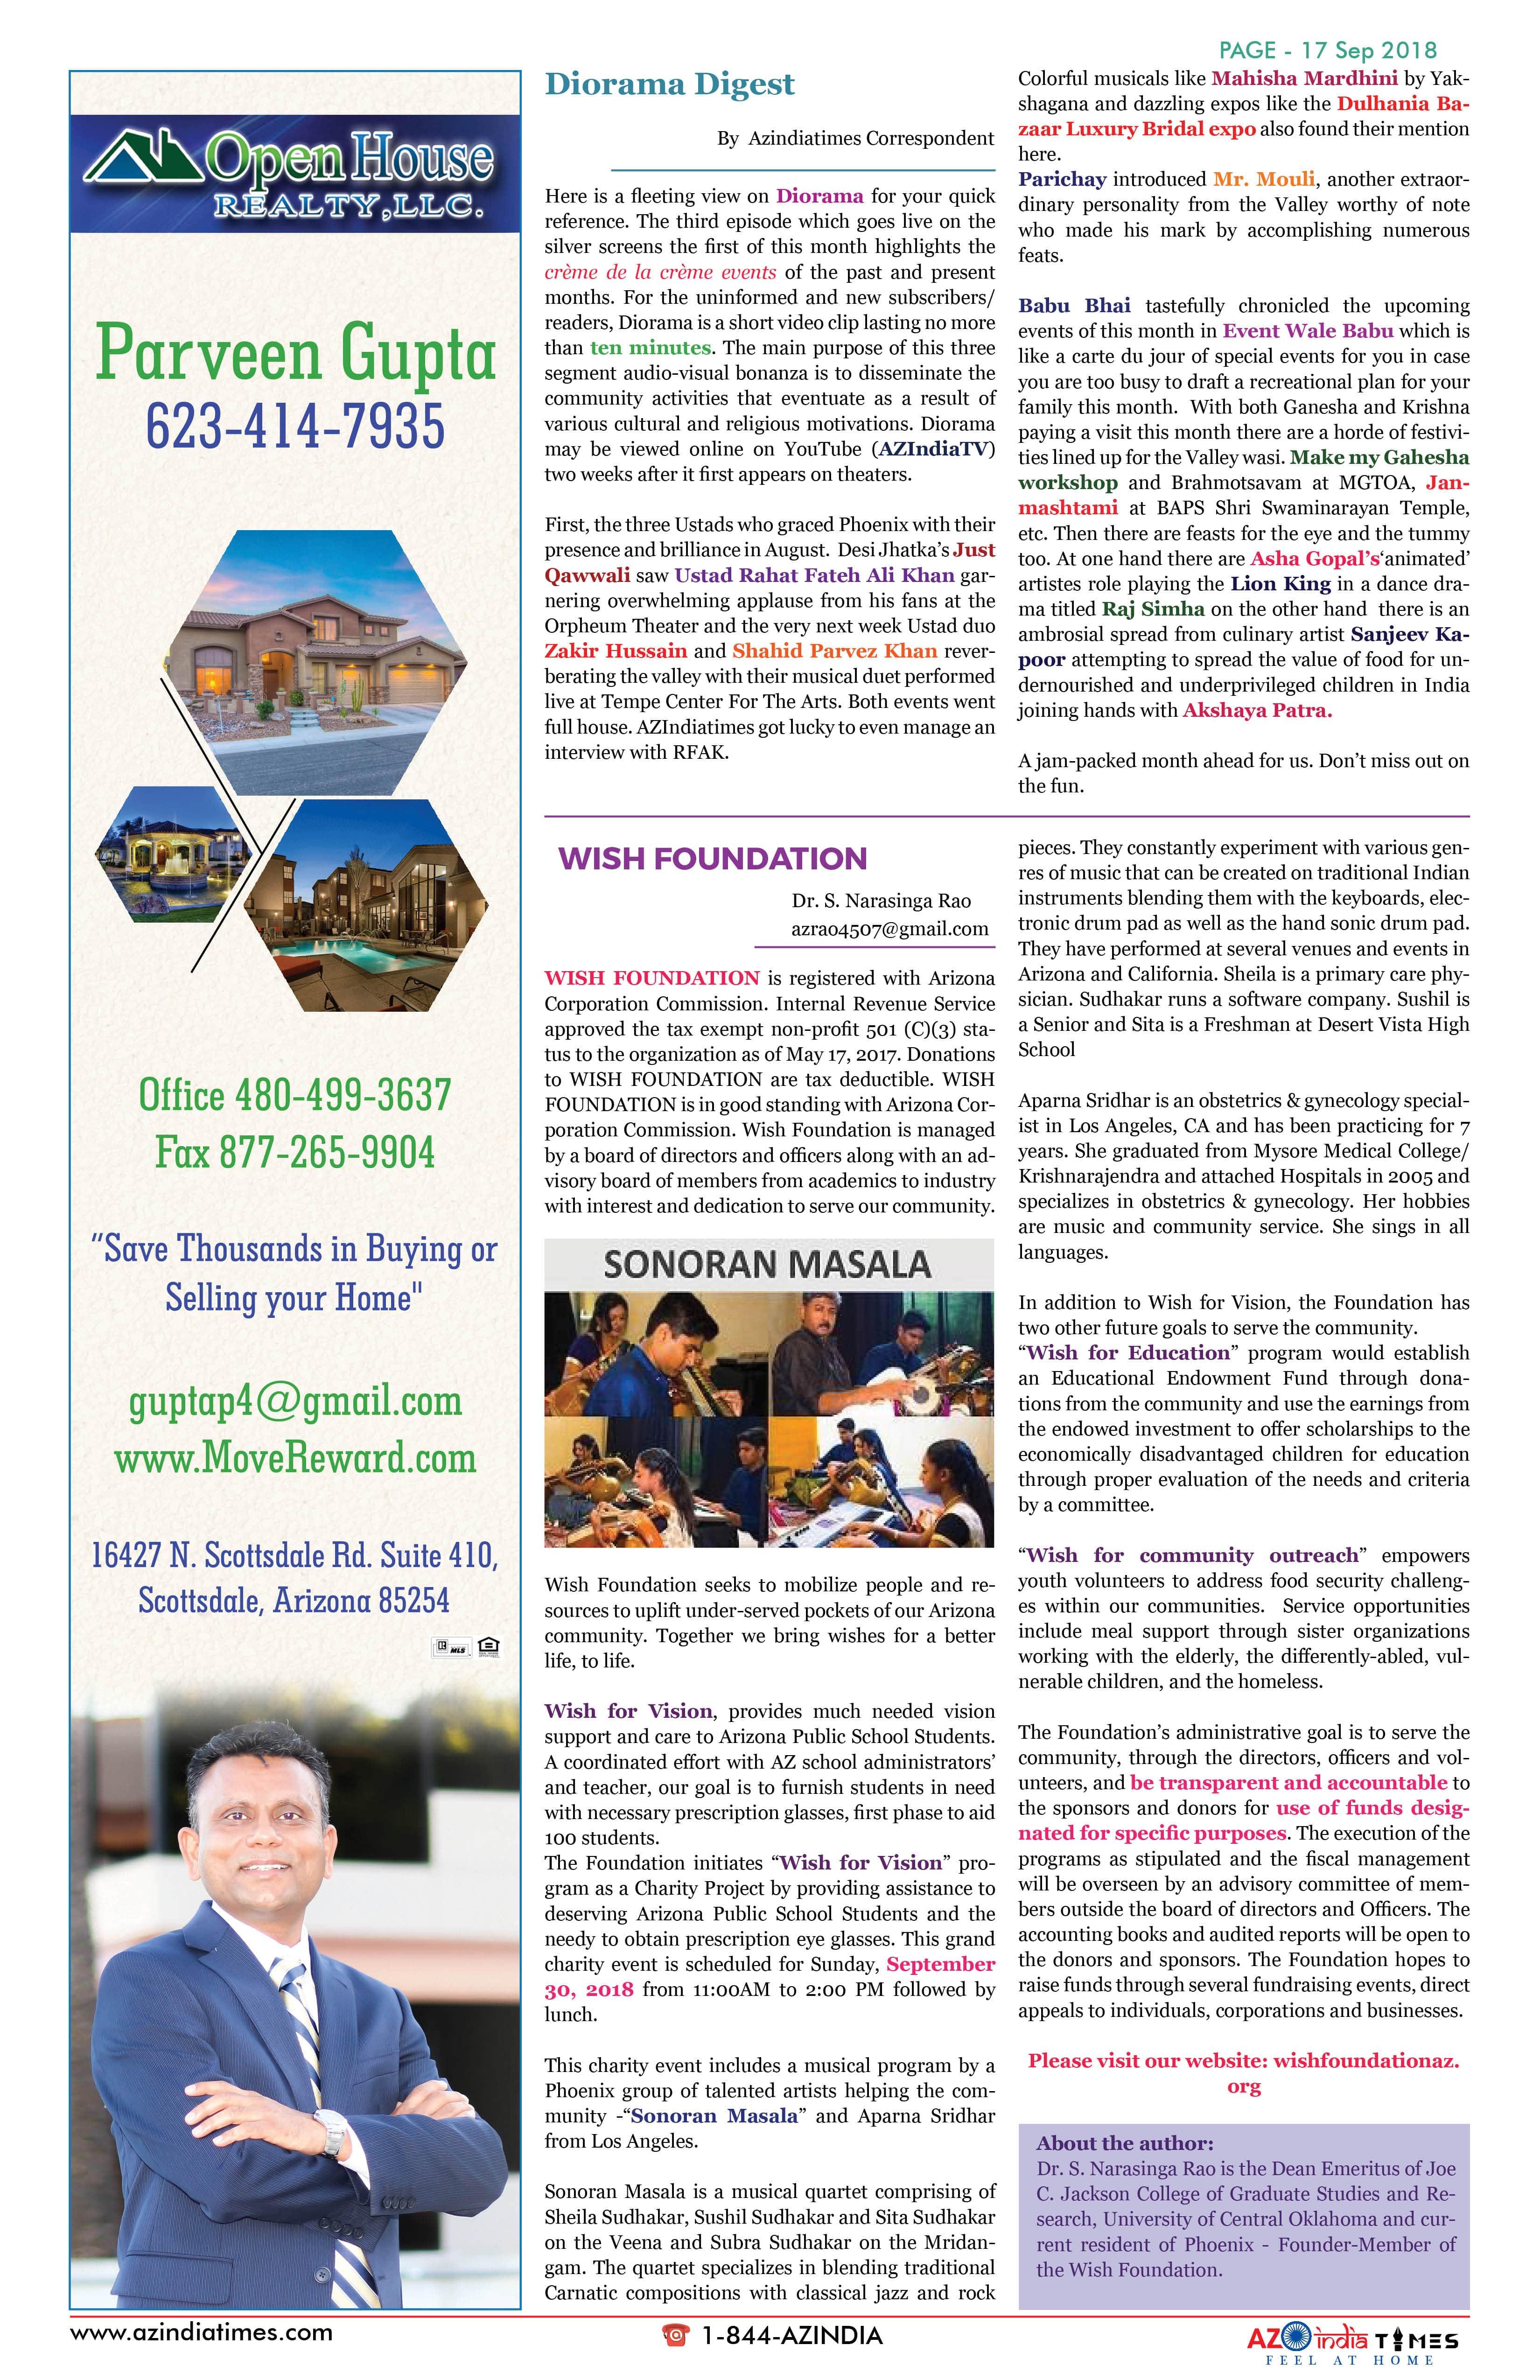 AZ INDIA SEPTEMBER  EDITION 17